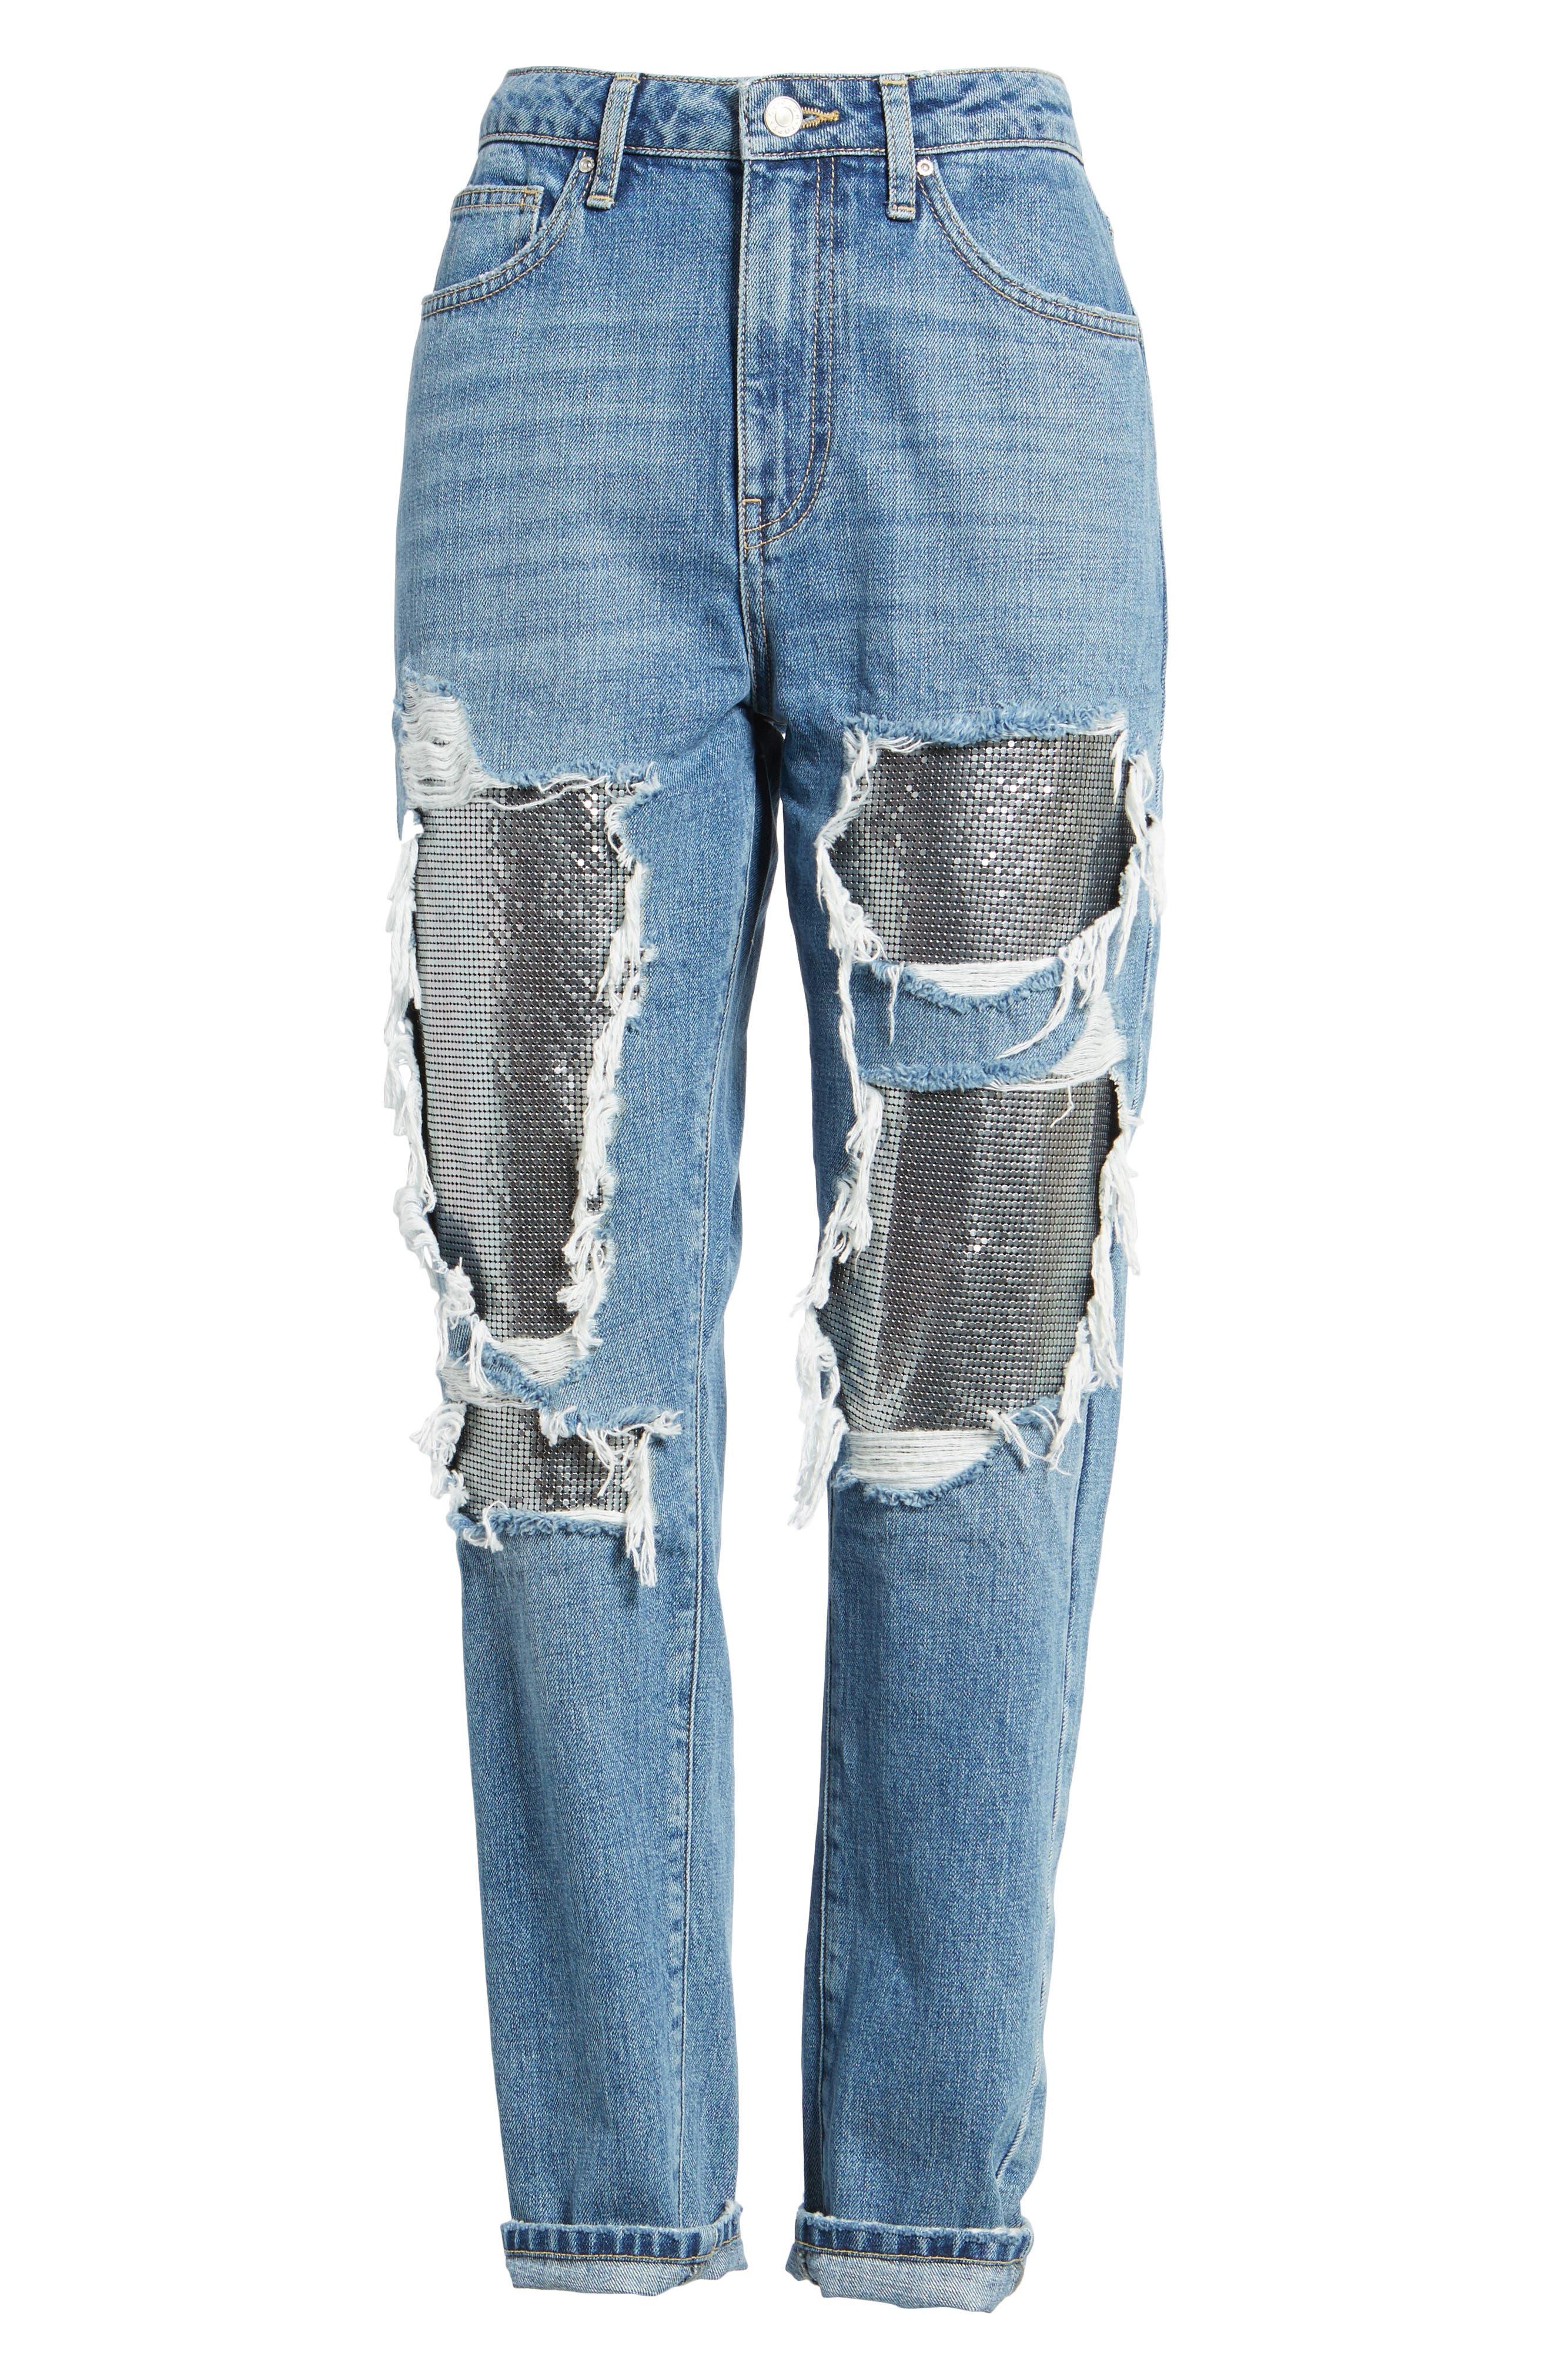 Chain Mail Boyfriend Jeans,                             Alternate thumbnail 8, color,                             Light Denim Multi